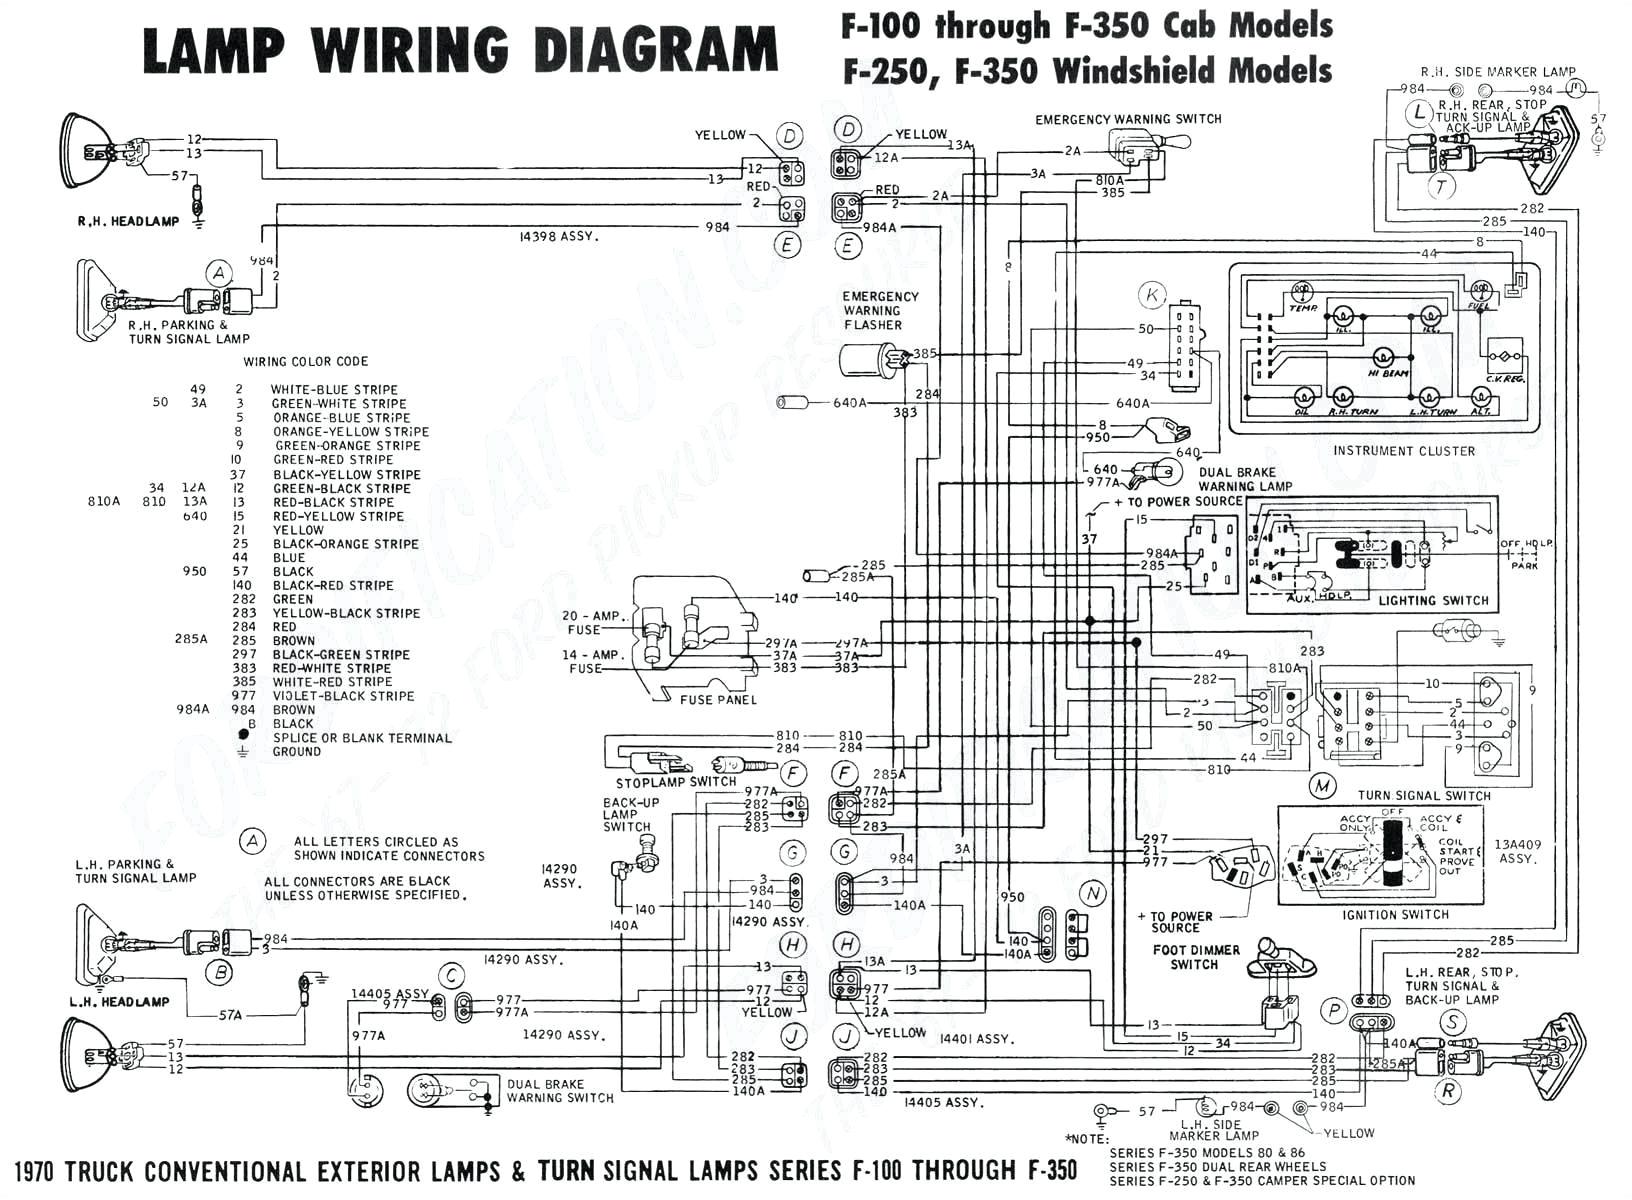 vdo 370 155 wiring diagram circuit diagram wiring diagram case 155 wiring diagram